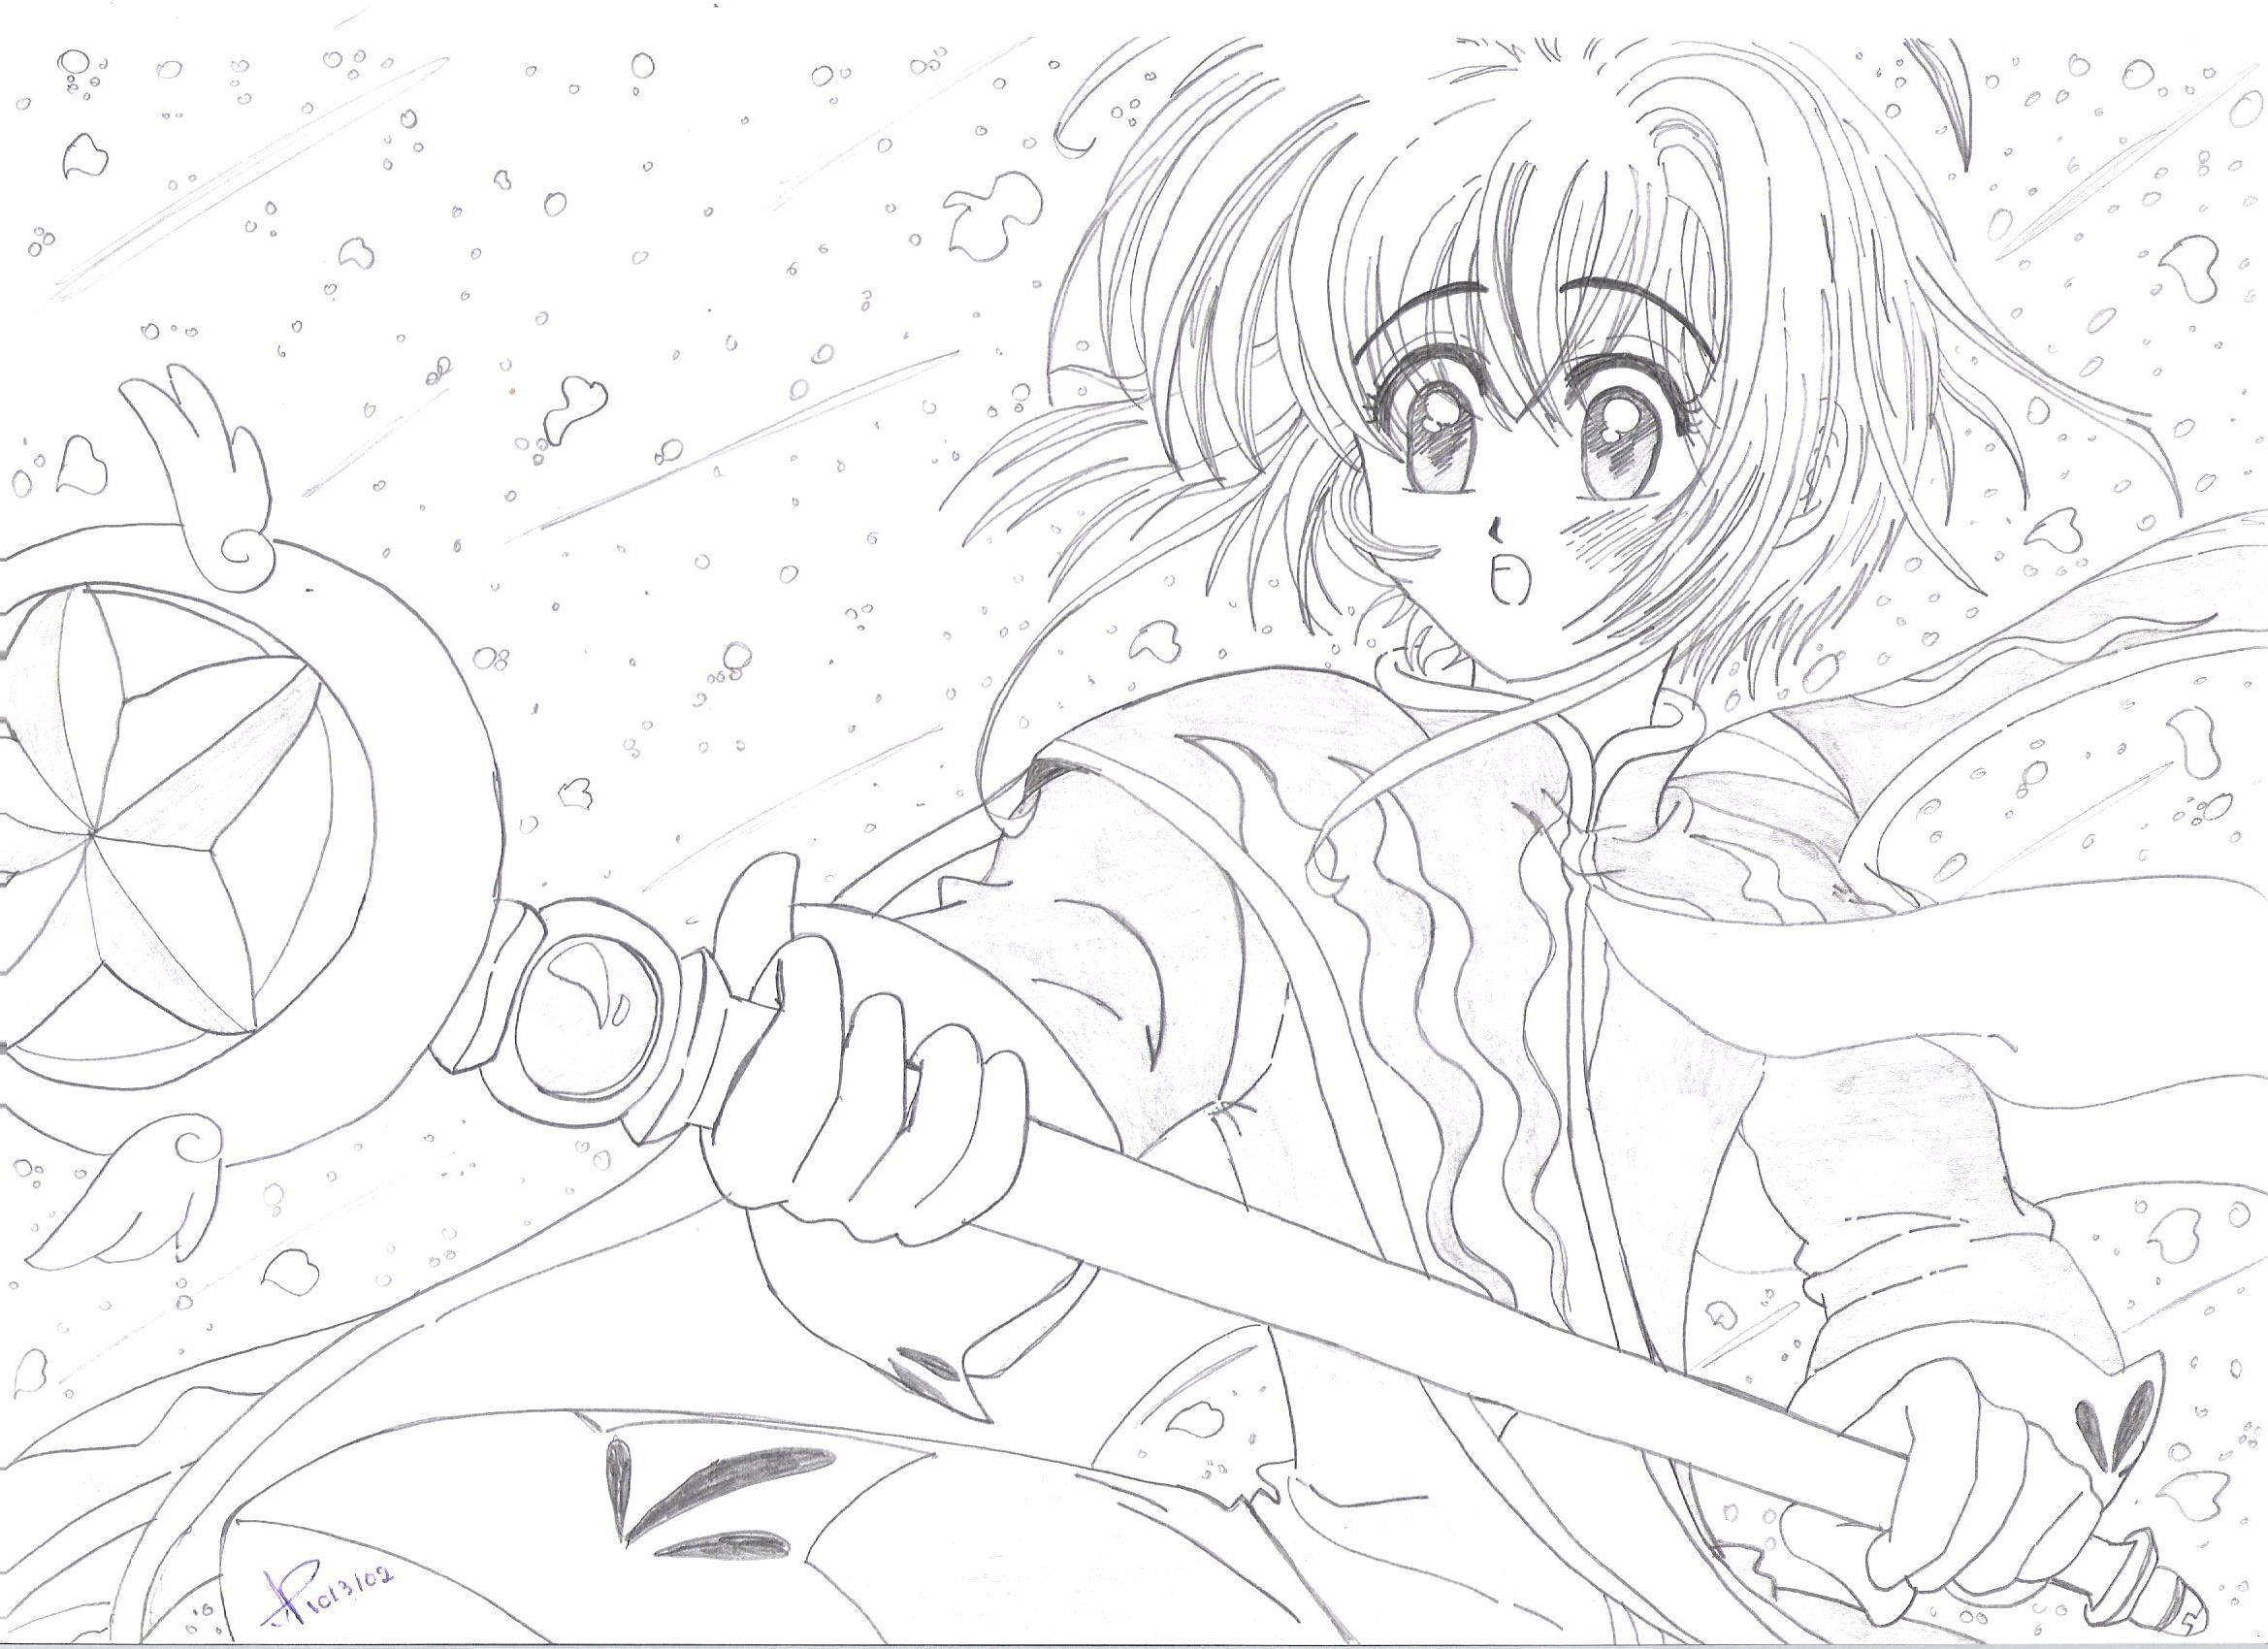 Sakura [lápis]